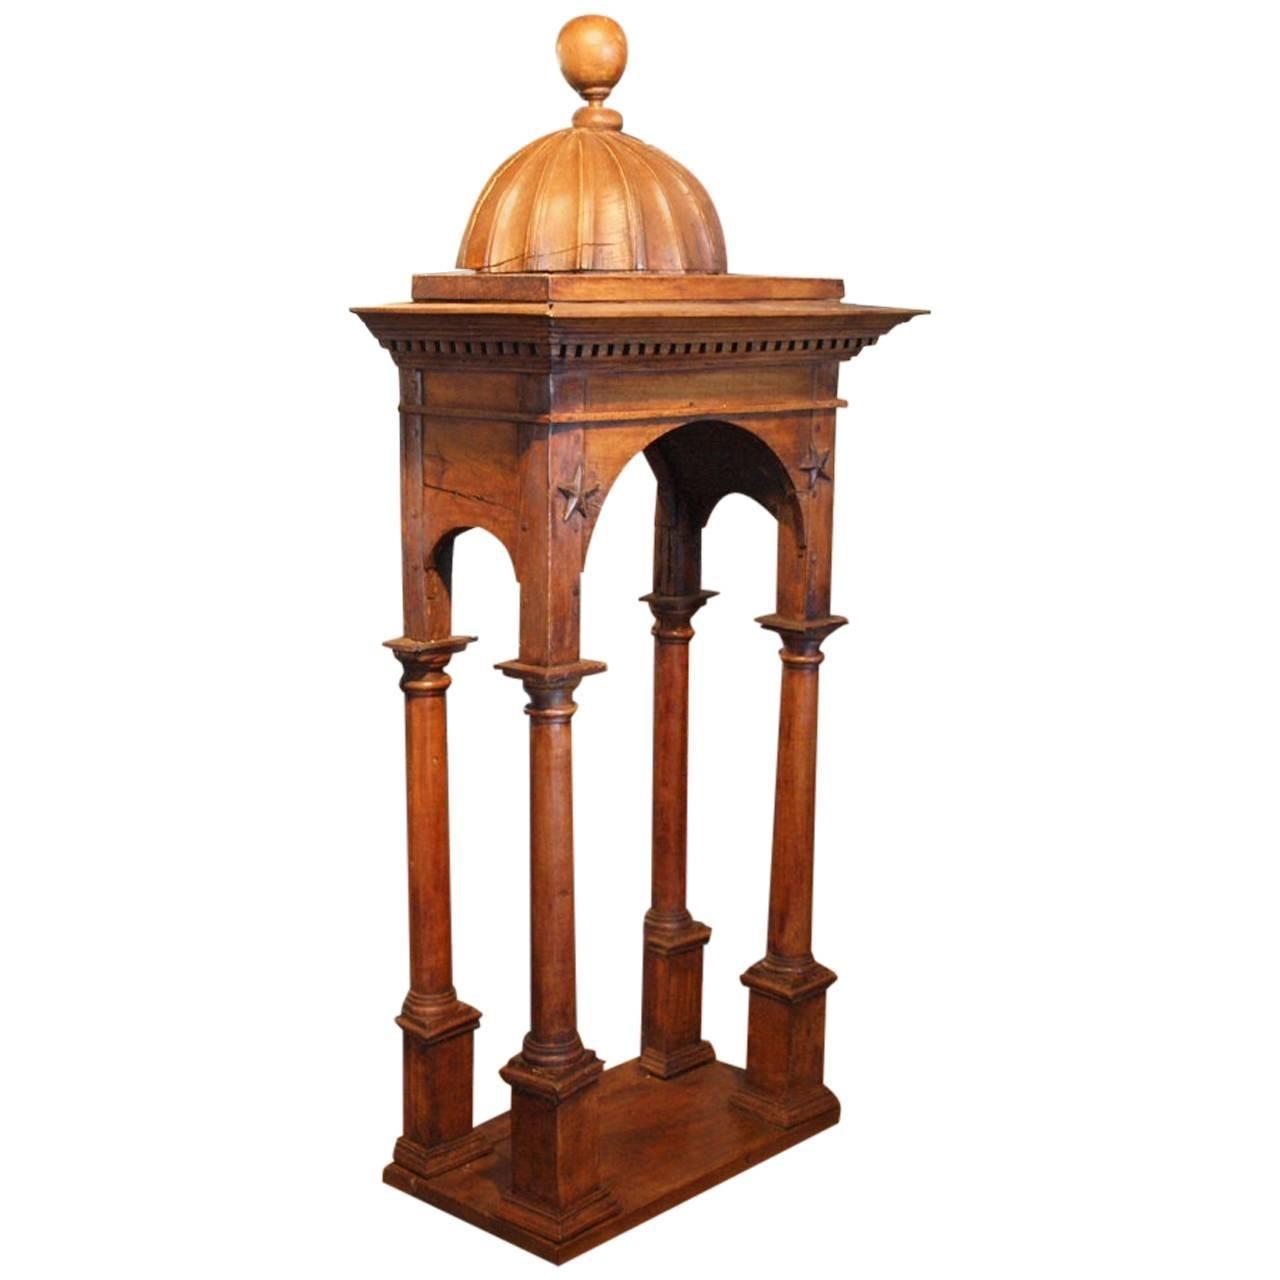 18th Century French Niche - Tabernacle in Walnut